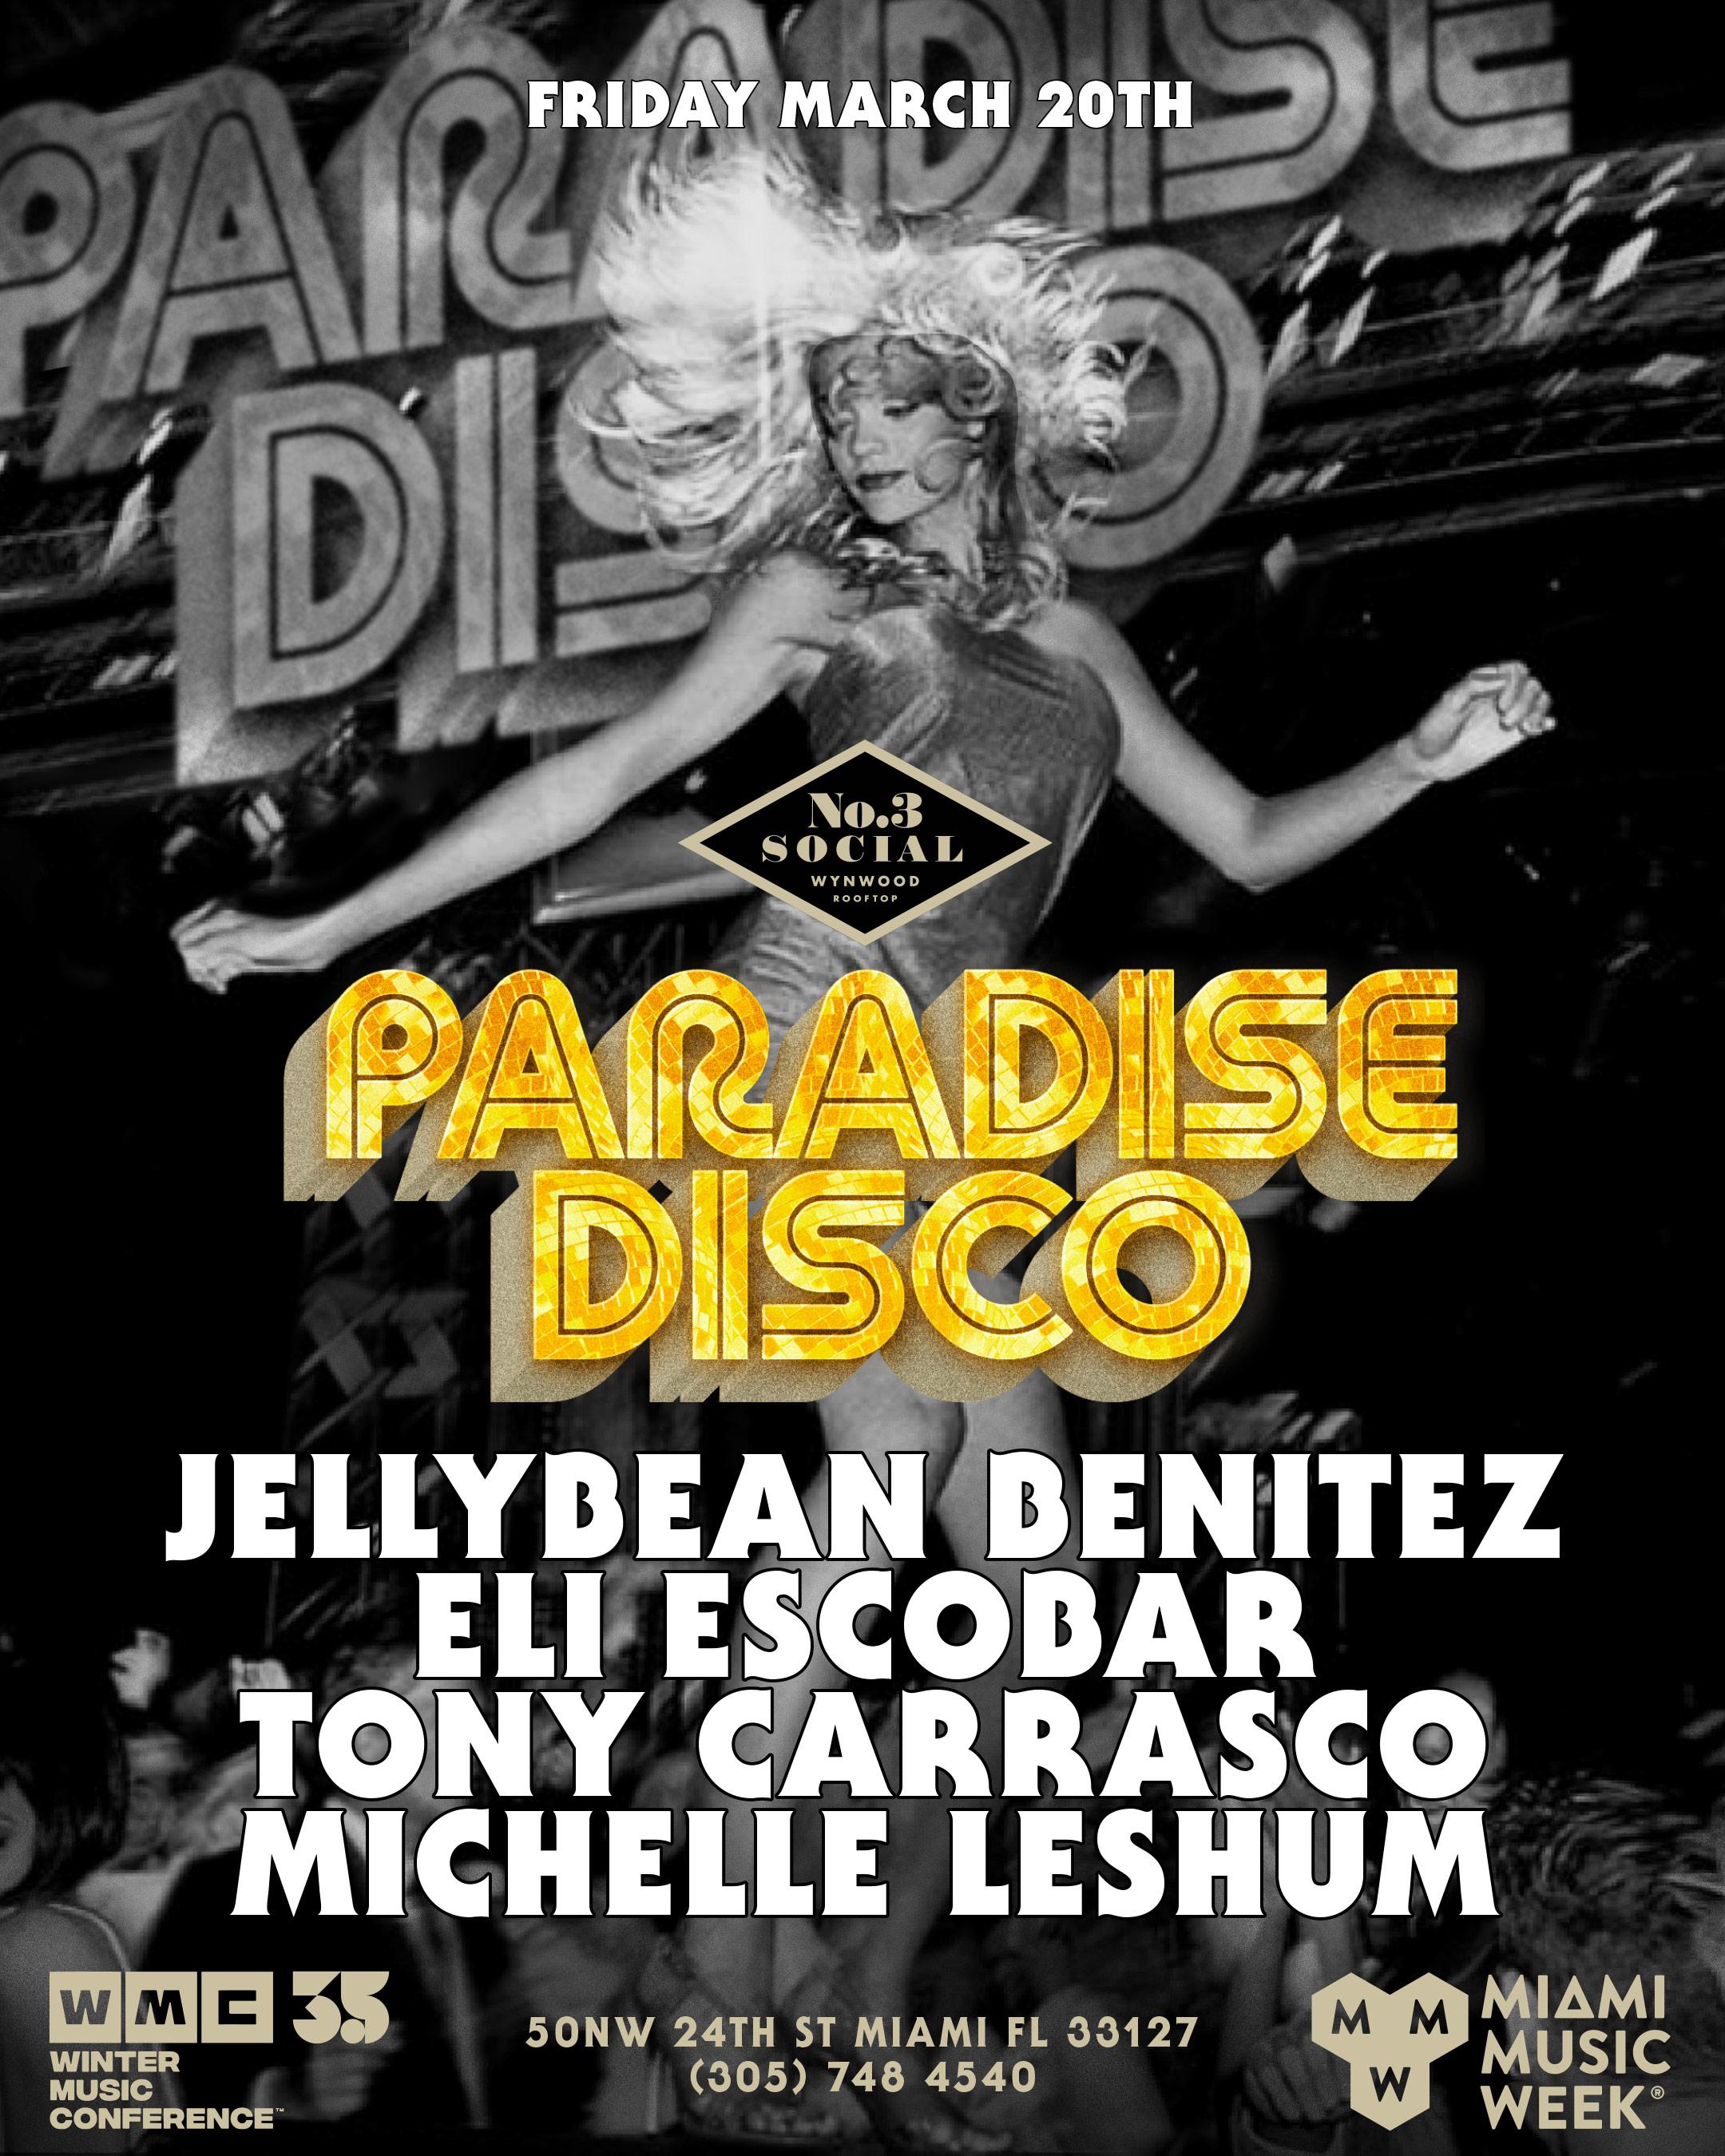 Paradise Disco Miami Music Week with Jellybean Benitez & Friends Flyer